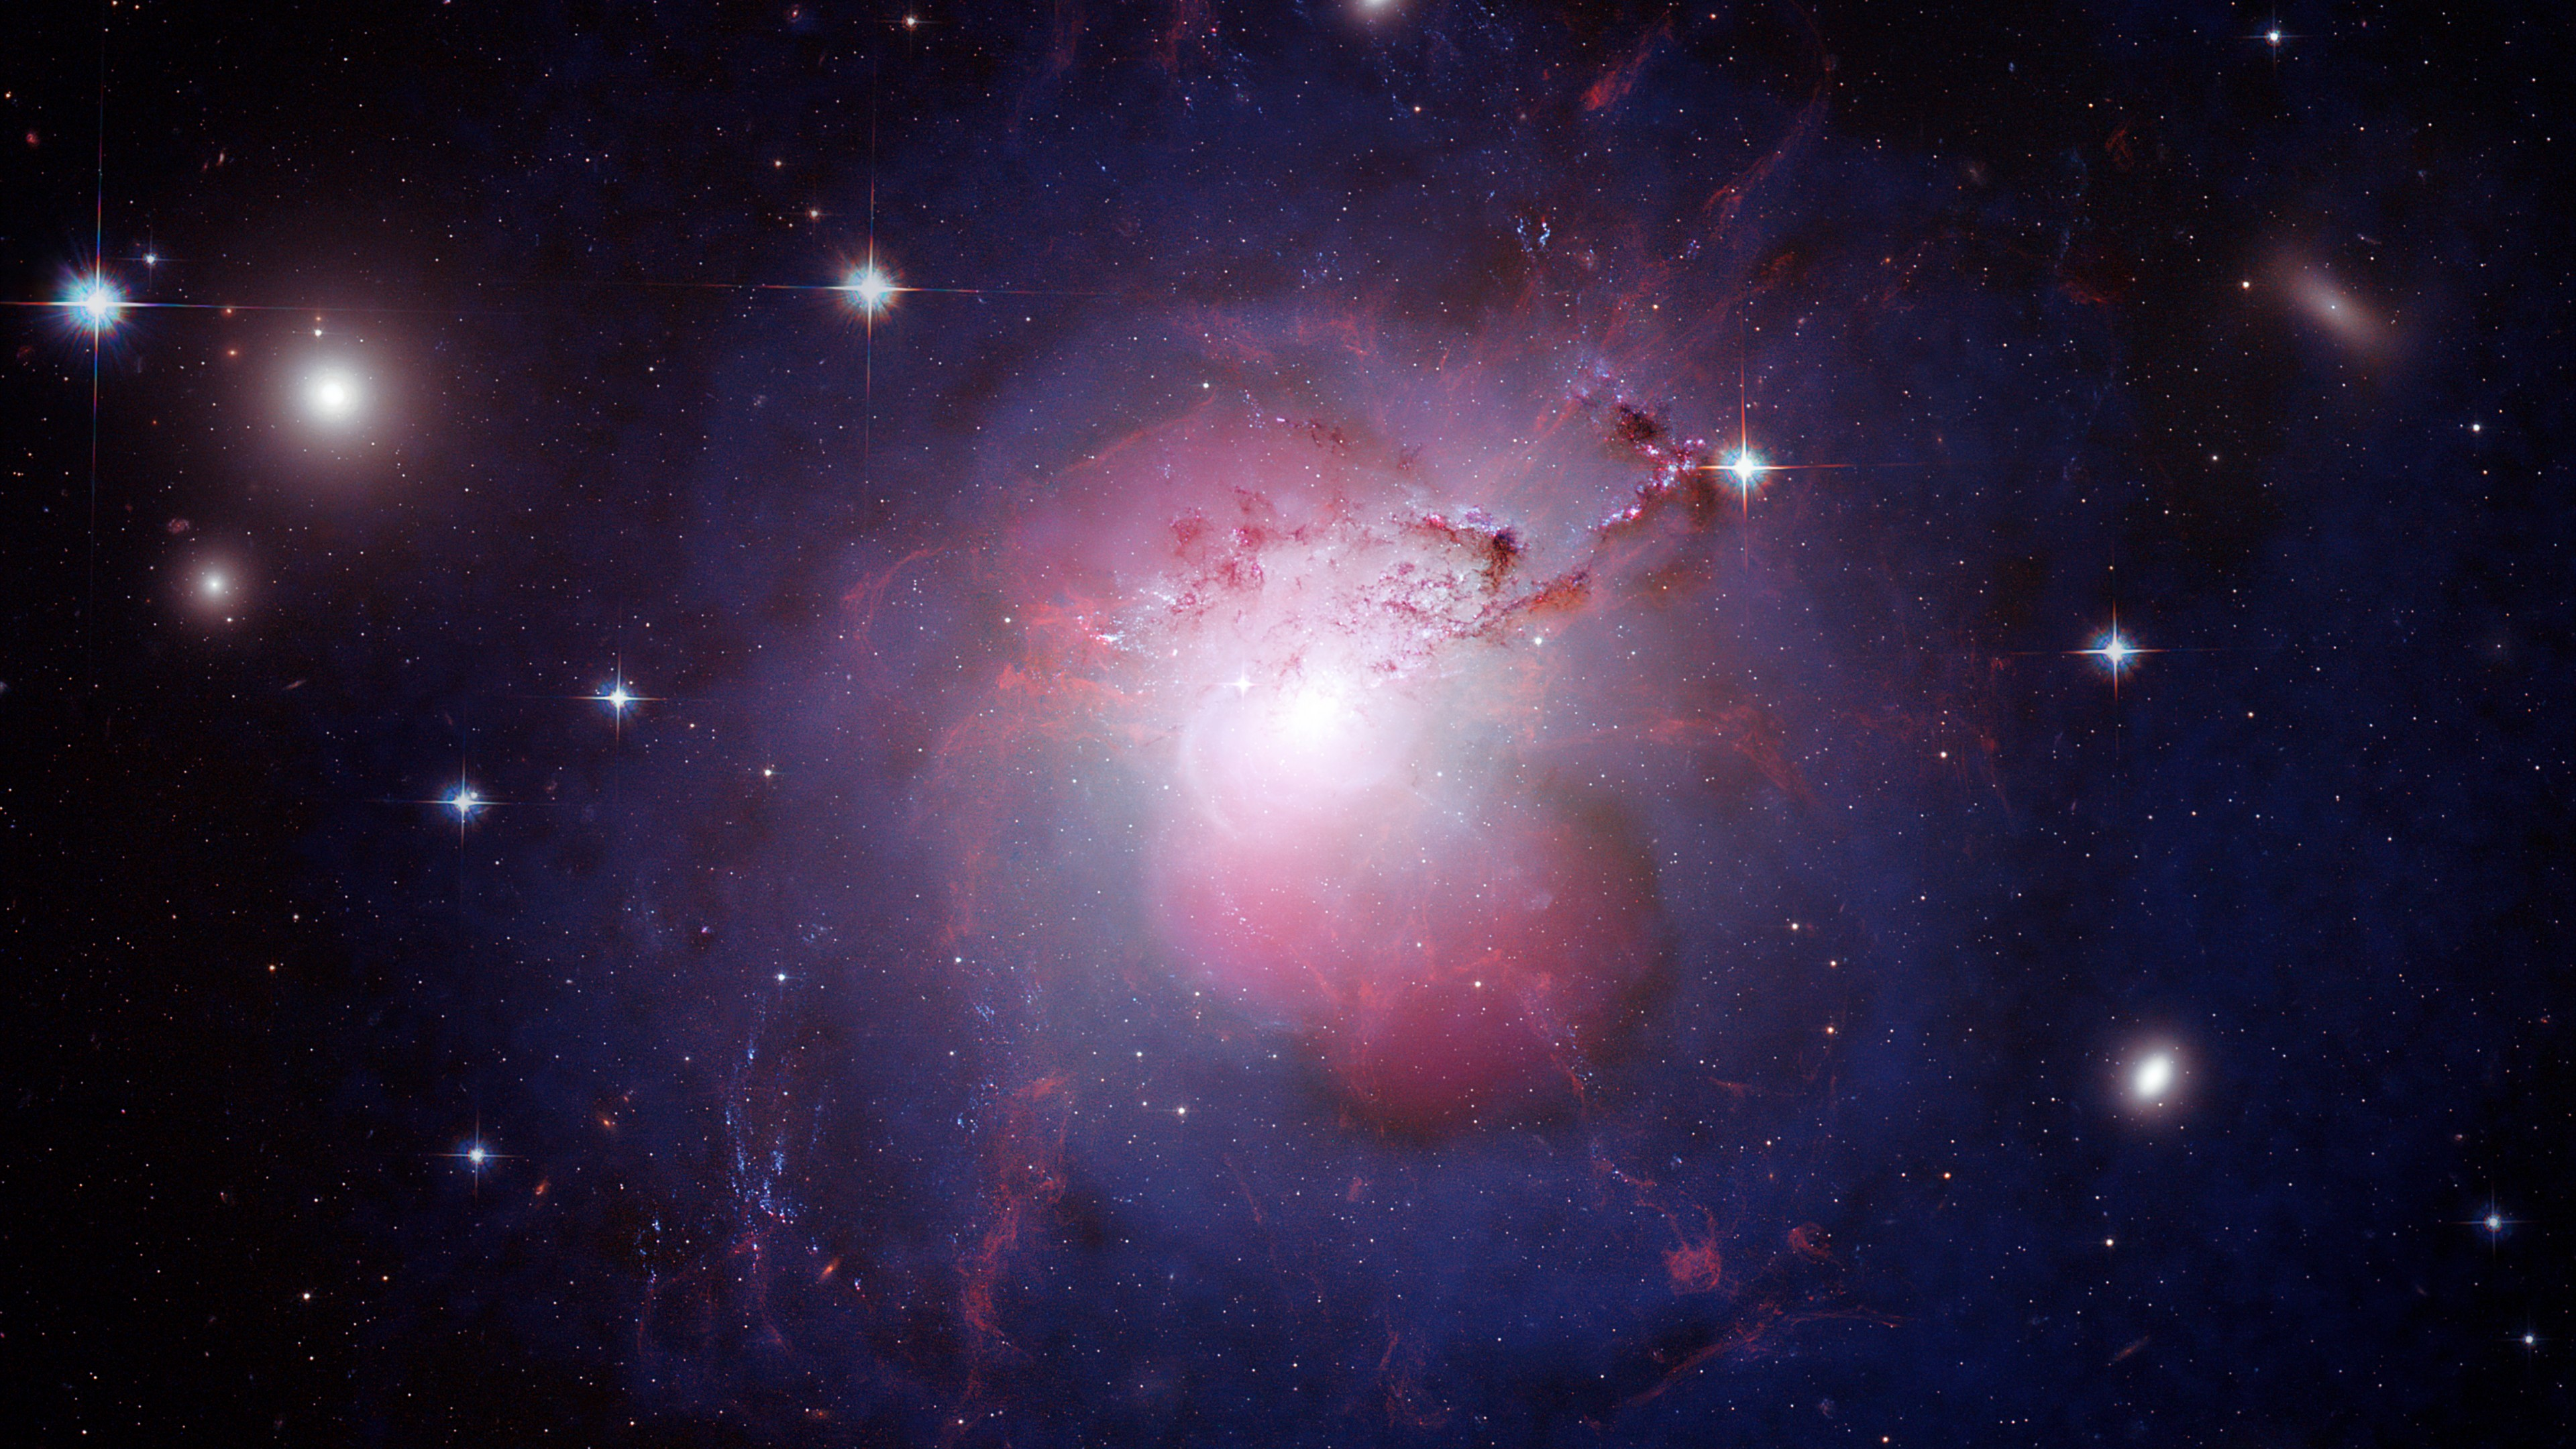 Galaxy Space Wallpaper 4k Apk Download: Wallpaper Nebula, Stars, Space, Galaxy, Space #5414